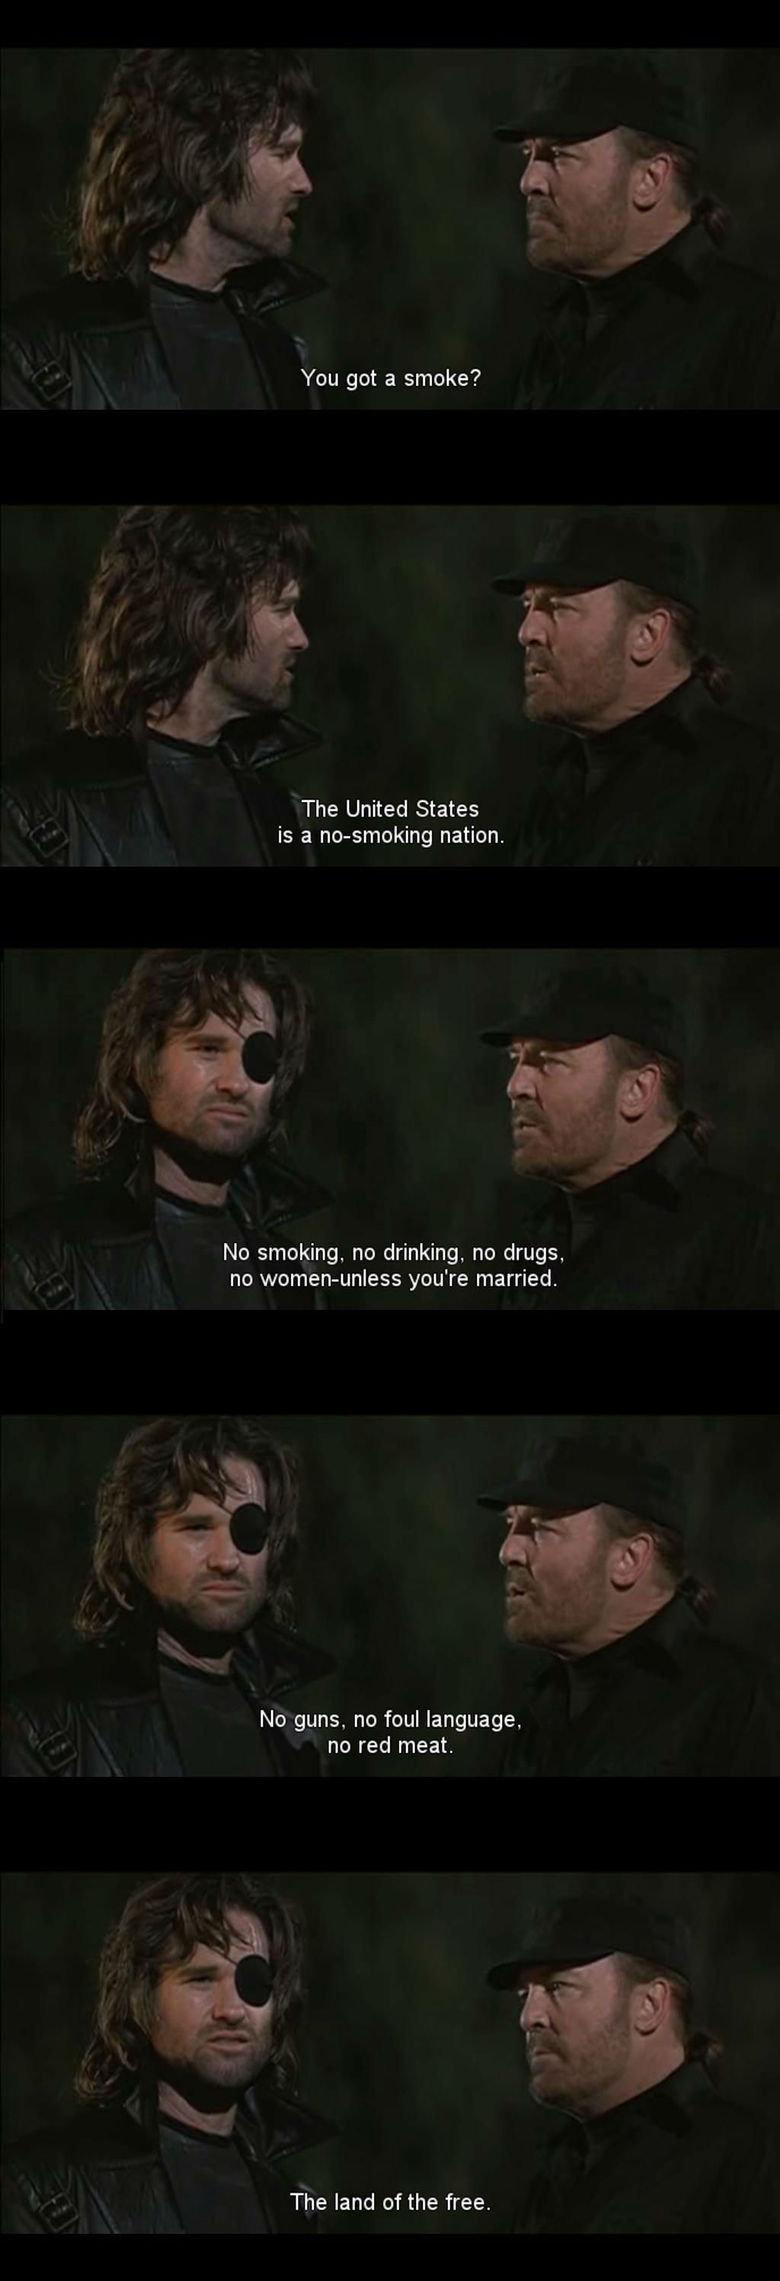 Stoner future. . You got a smoke? The United States is a nonsmoking nation. No smoking, no drinking, no drugs, no you' re married, No guns, no foul language, no Stoner future You got a smoke? The United States is nonsmoking nation No smoking no drinking drugs you' re married guns foul language